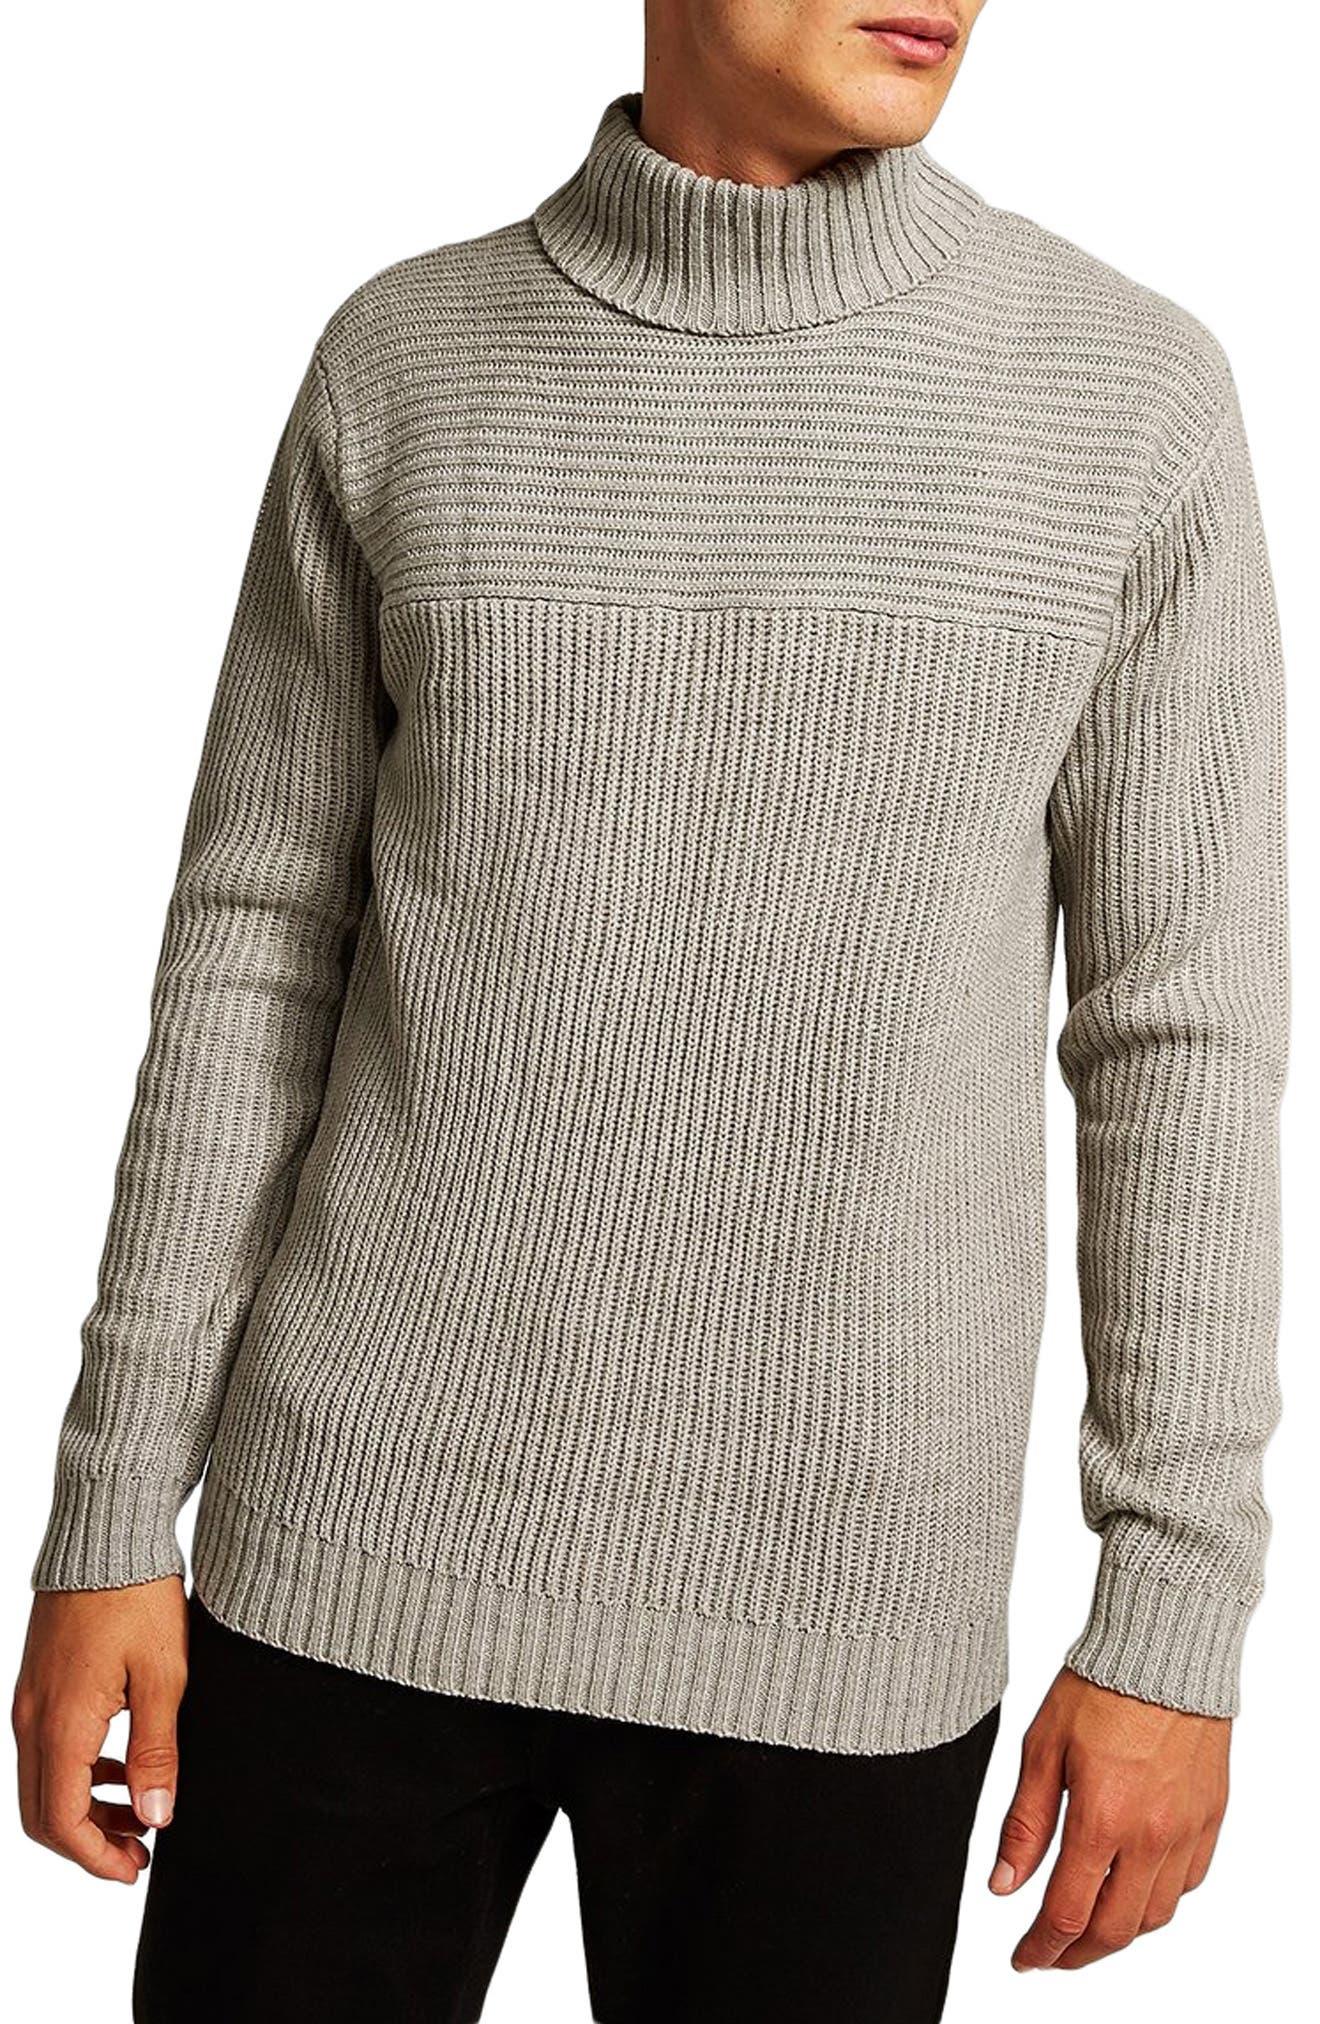 Flint Ribbed Turtleneck Sweater,                         Main,                         color, 020